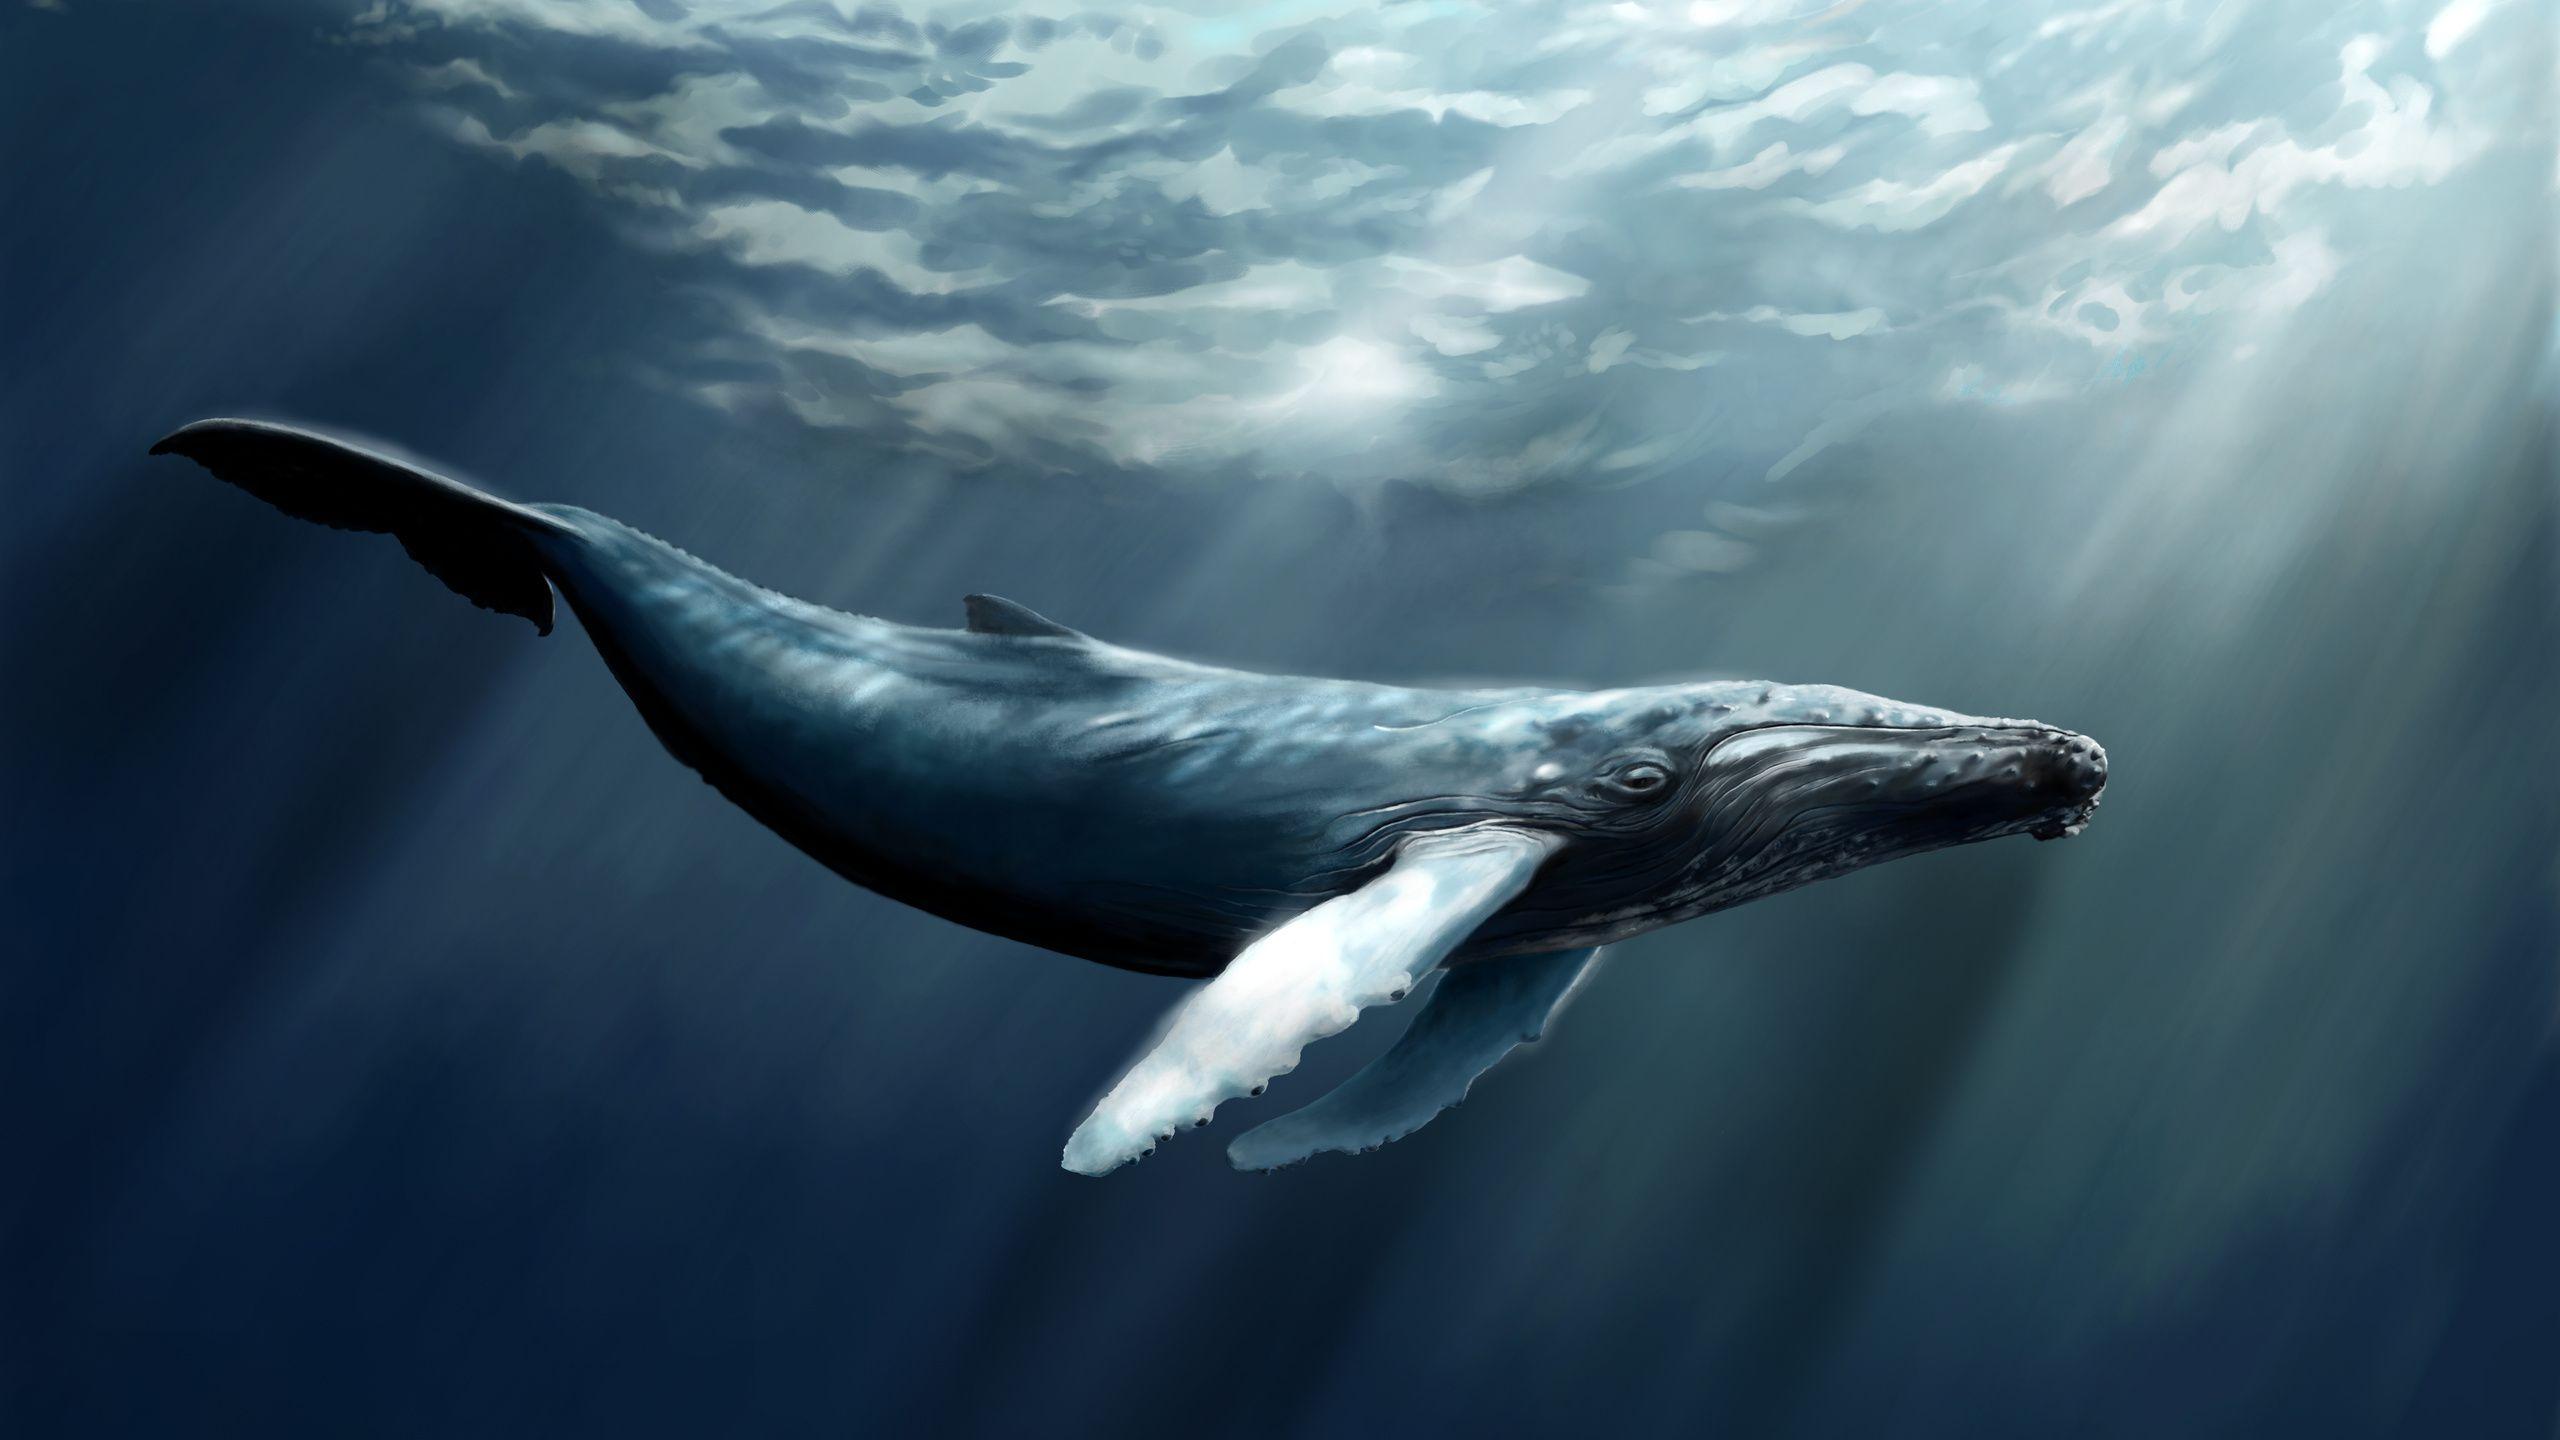 Humpback Whale Desktop Wallpaper Whale Artwork Whale Humpback Whale